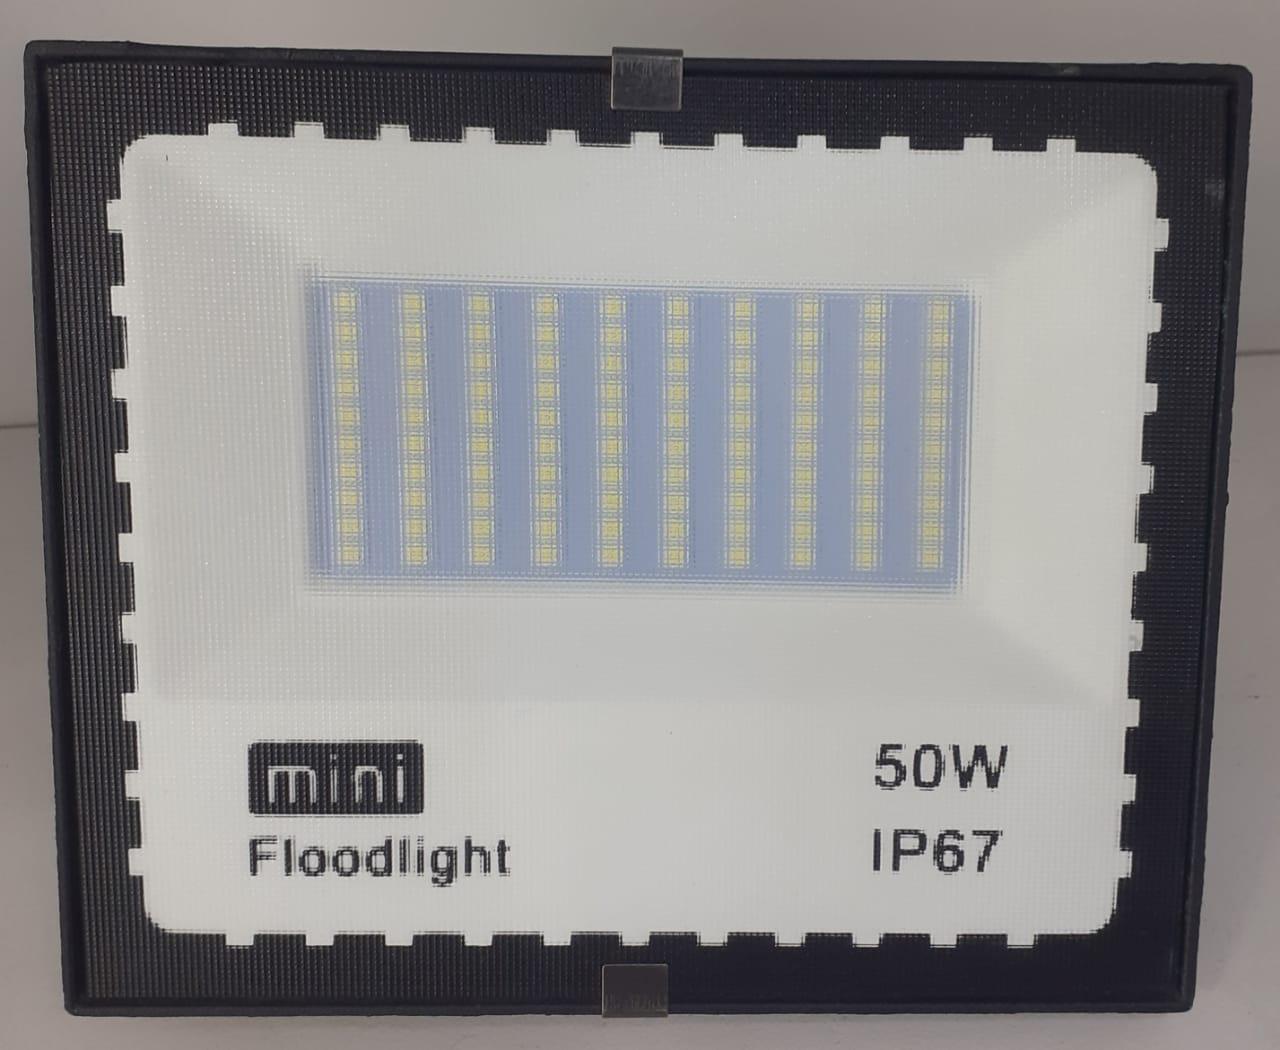 Kit 10 Mini Refletores Holofote JORTAN LED SMD 50W Branco Frio IP67